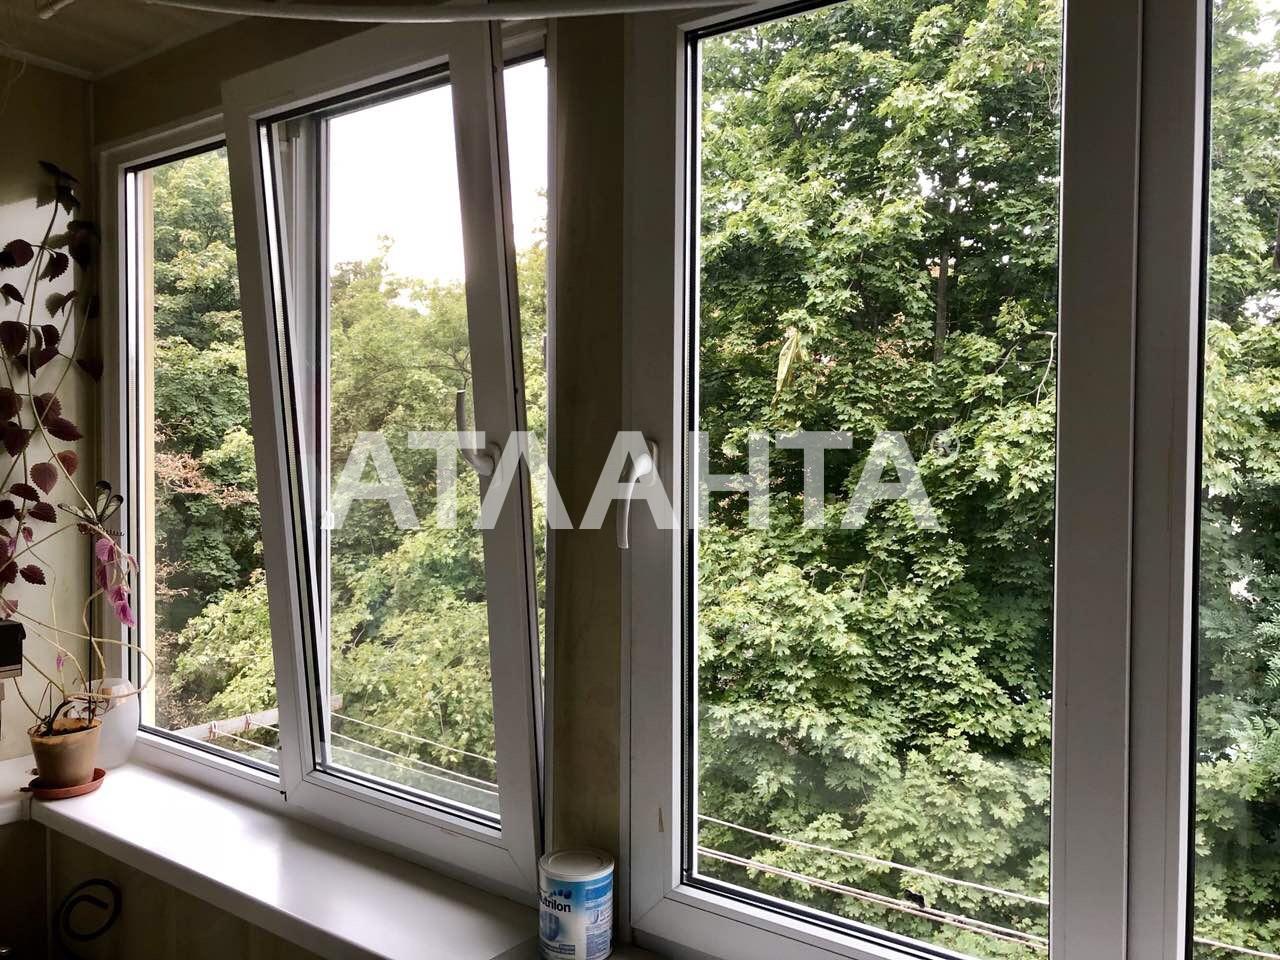 Продается 3-комнатная Квартира на ул. Терешковой — 42 000 у.е. (фото №11)